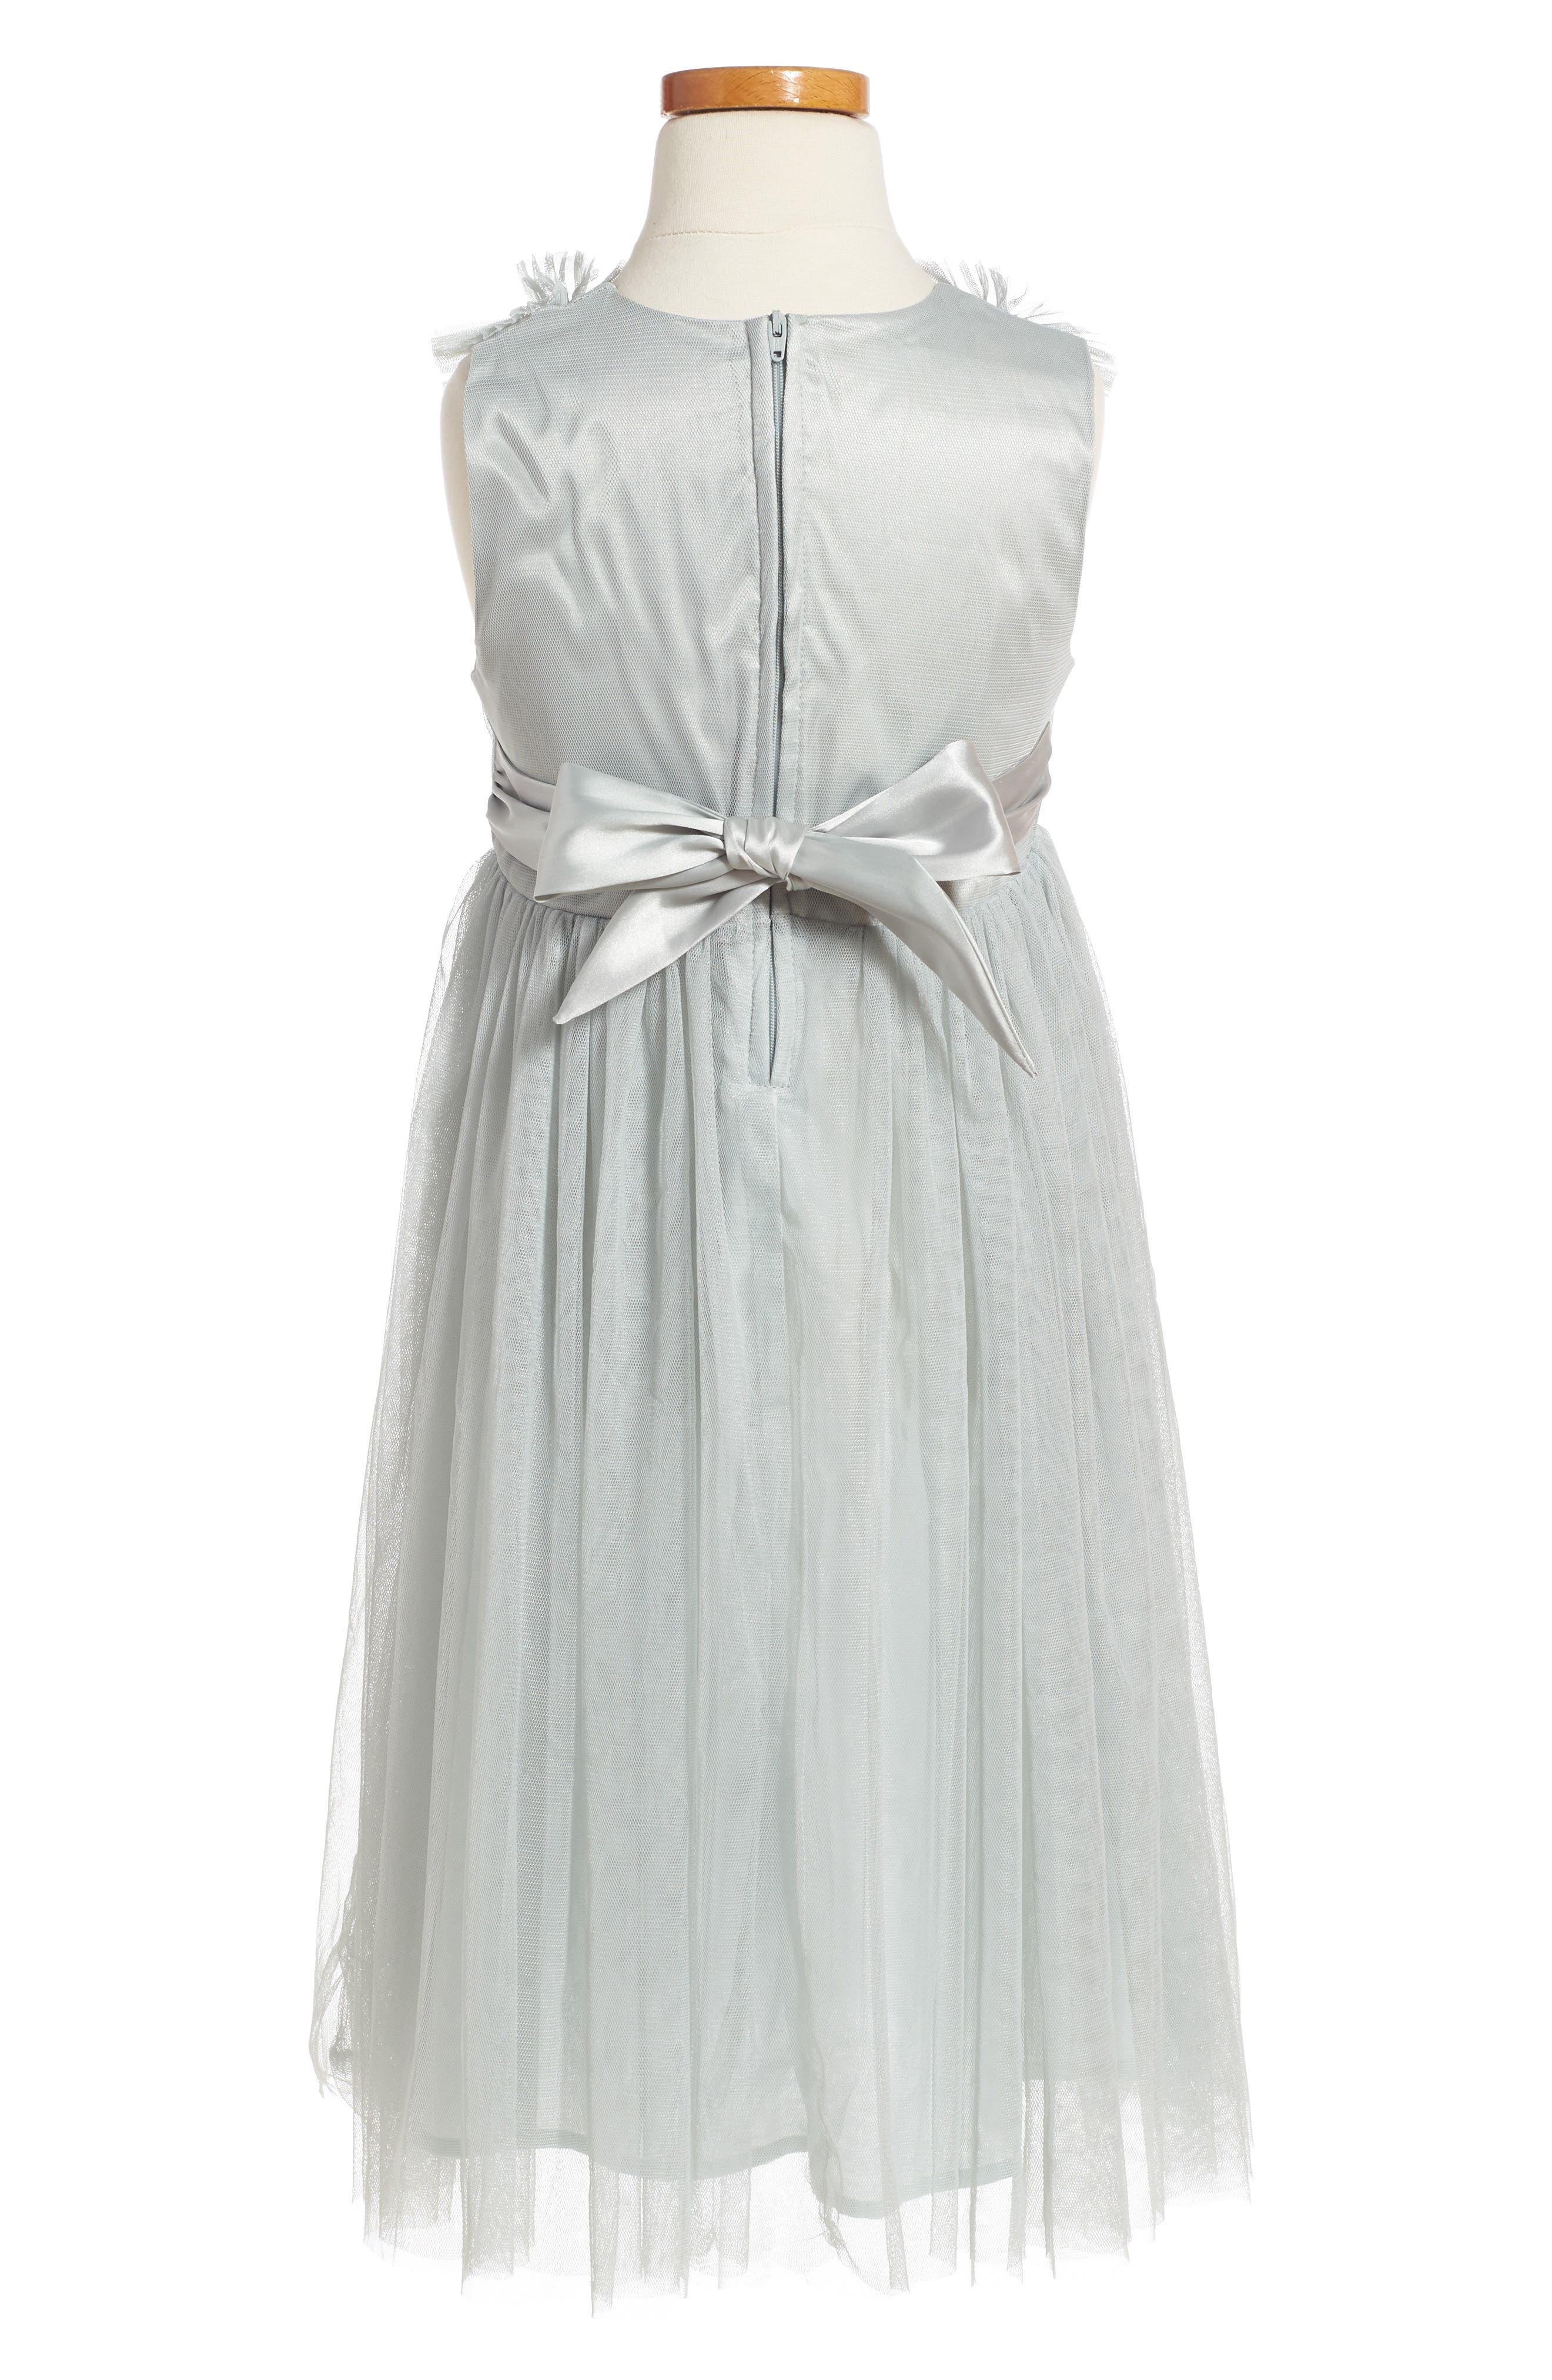 Alternate Image 2  - Popatu Sleeveless Tulle Dress (Toddler Girls, Little Girls & Big Girls)